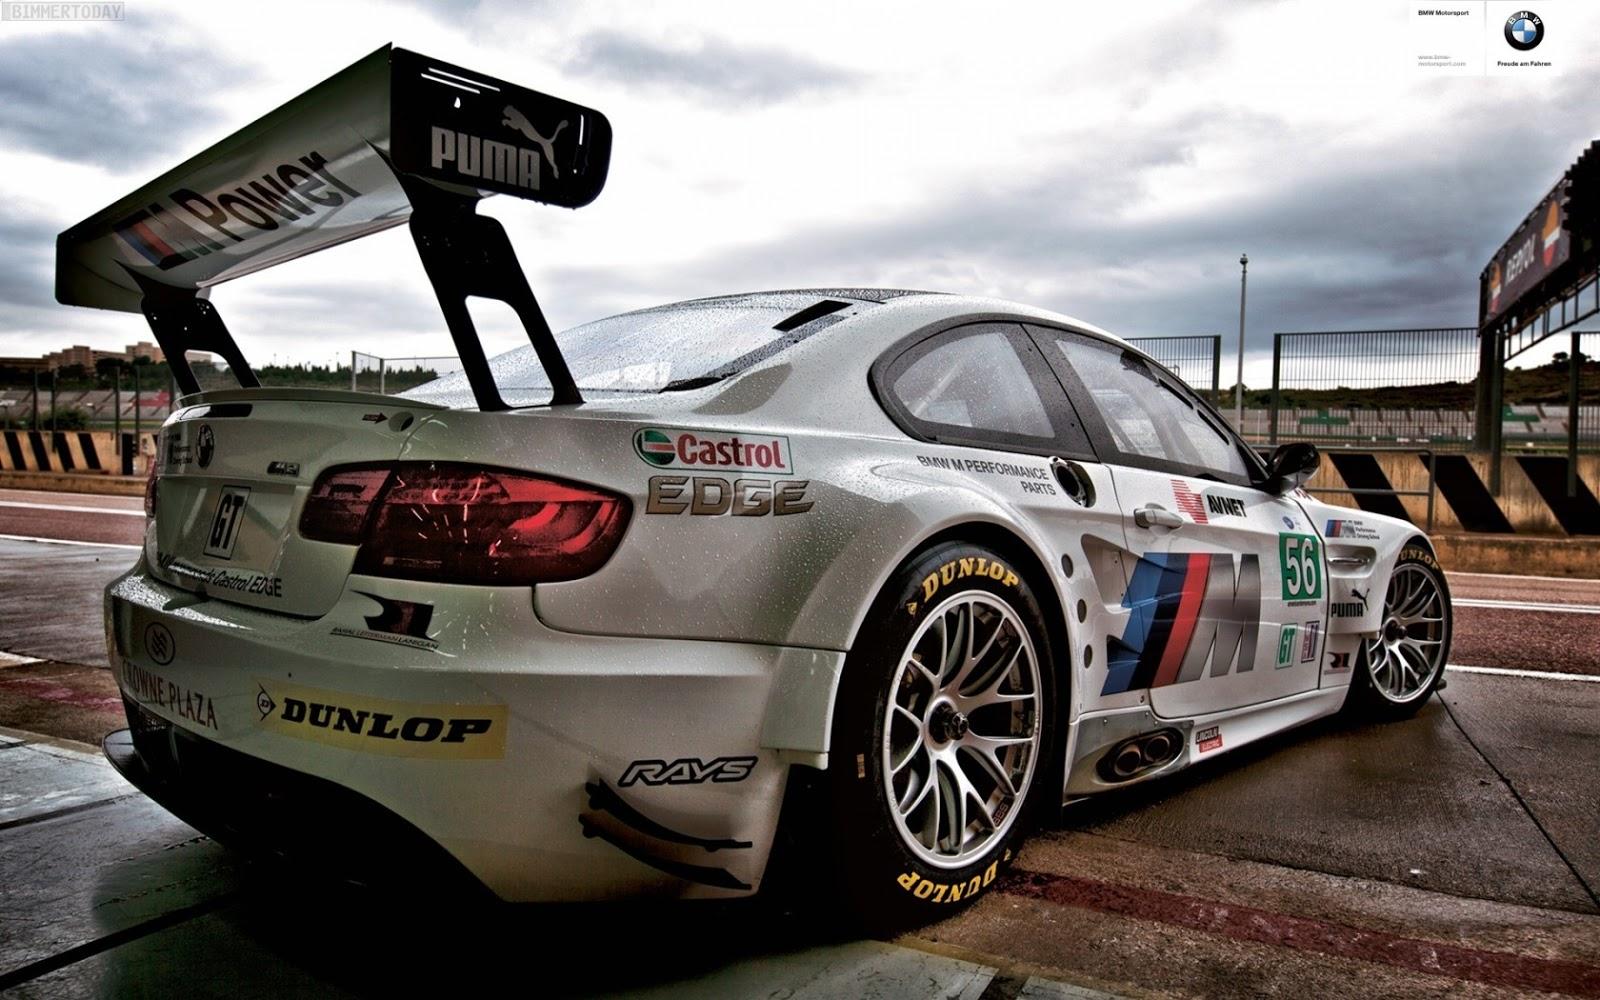 Wallpaper Name: BMW Sport Car Wallpapers; Best Resolution: 1280x720 HD ...